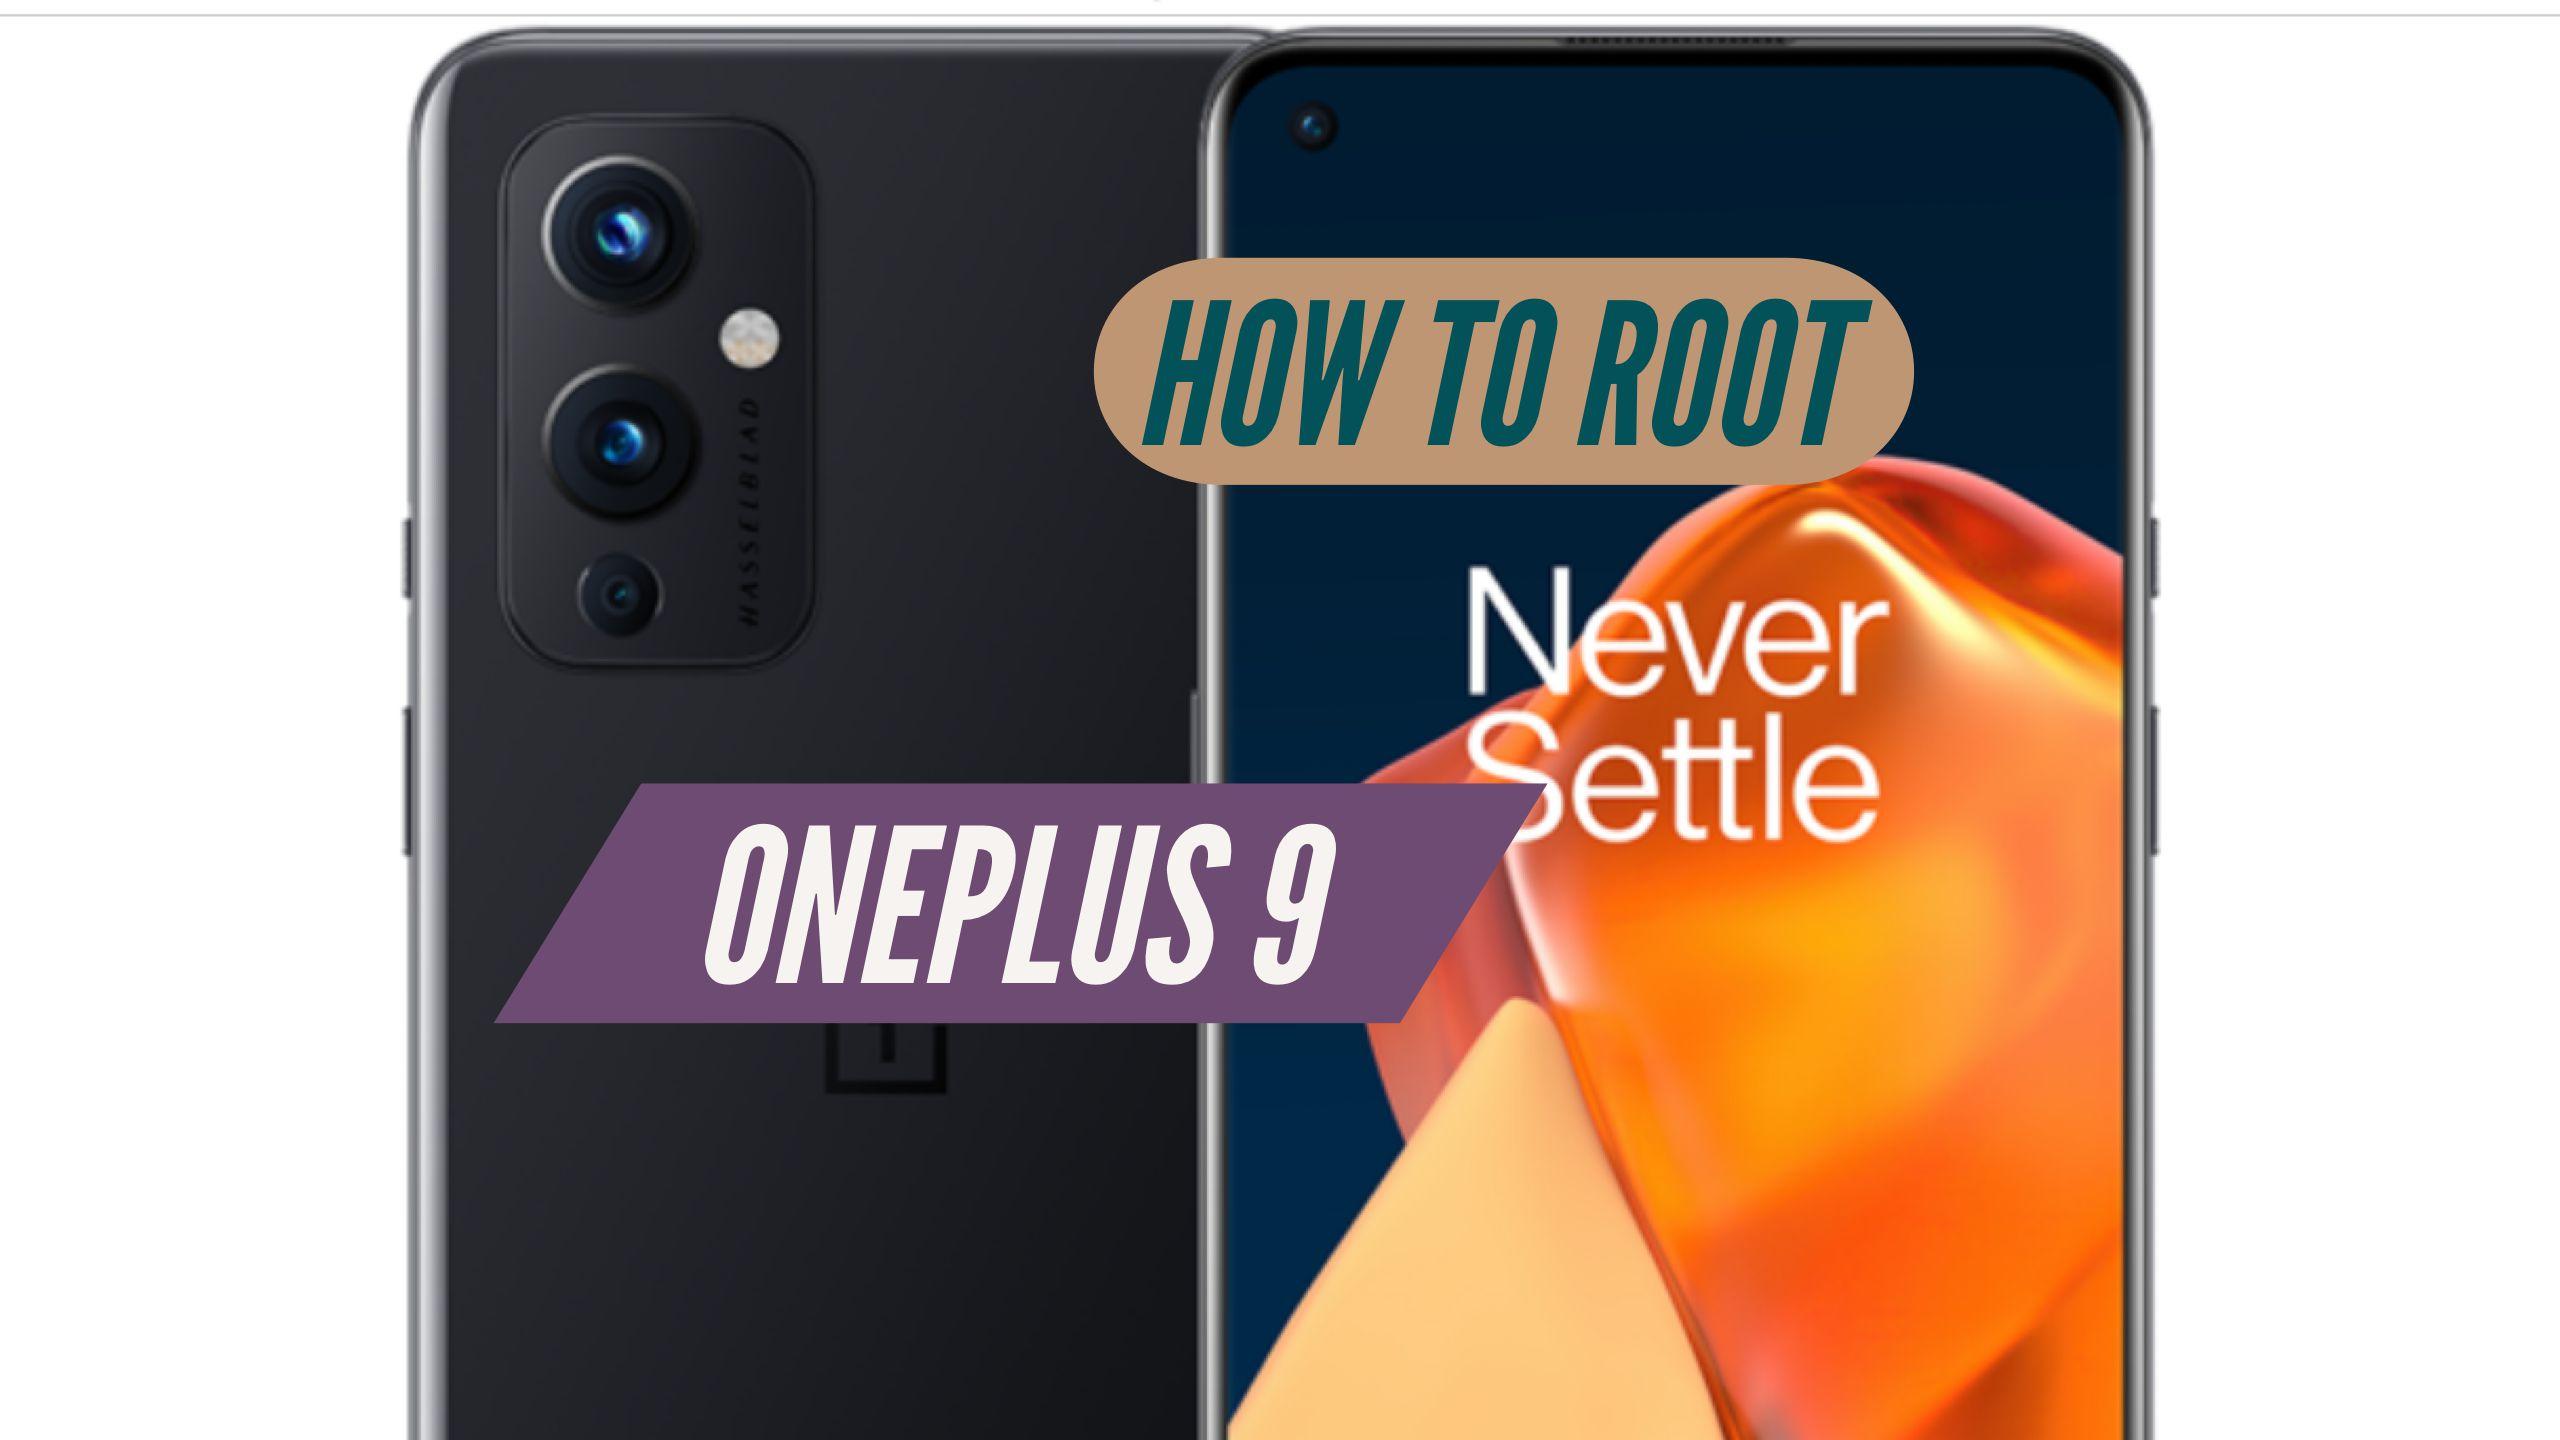 OnePlus 9 Root